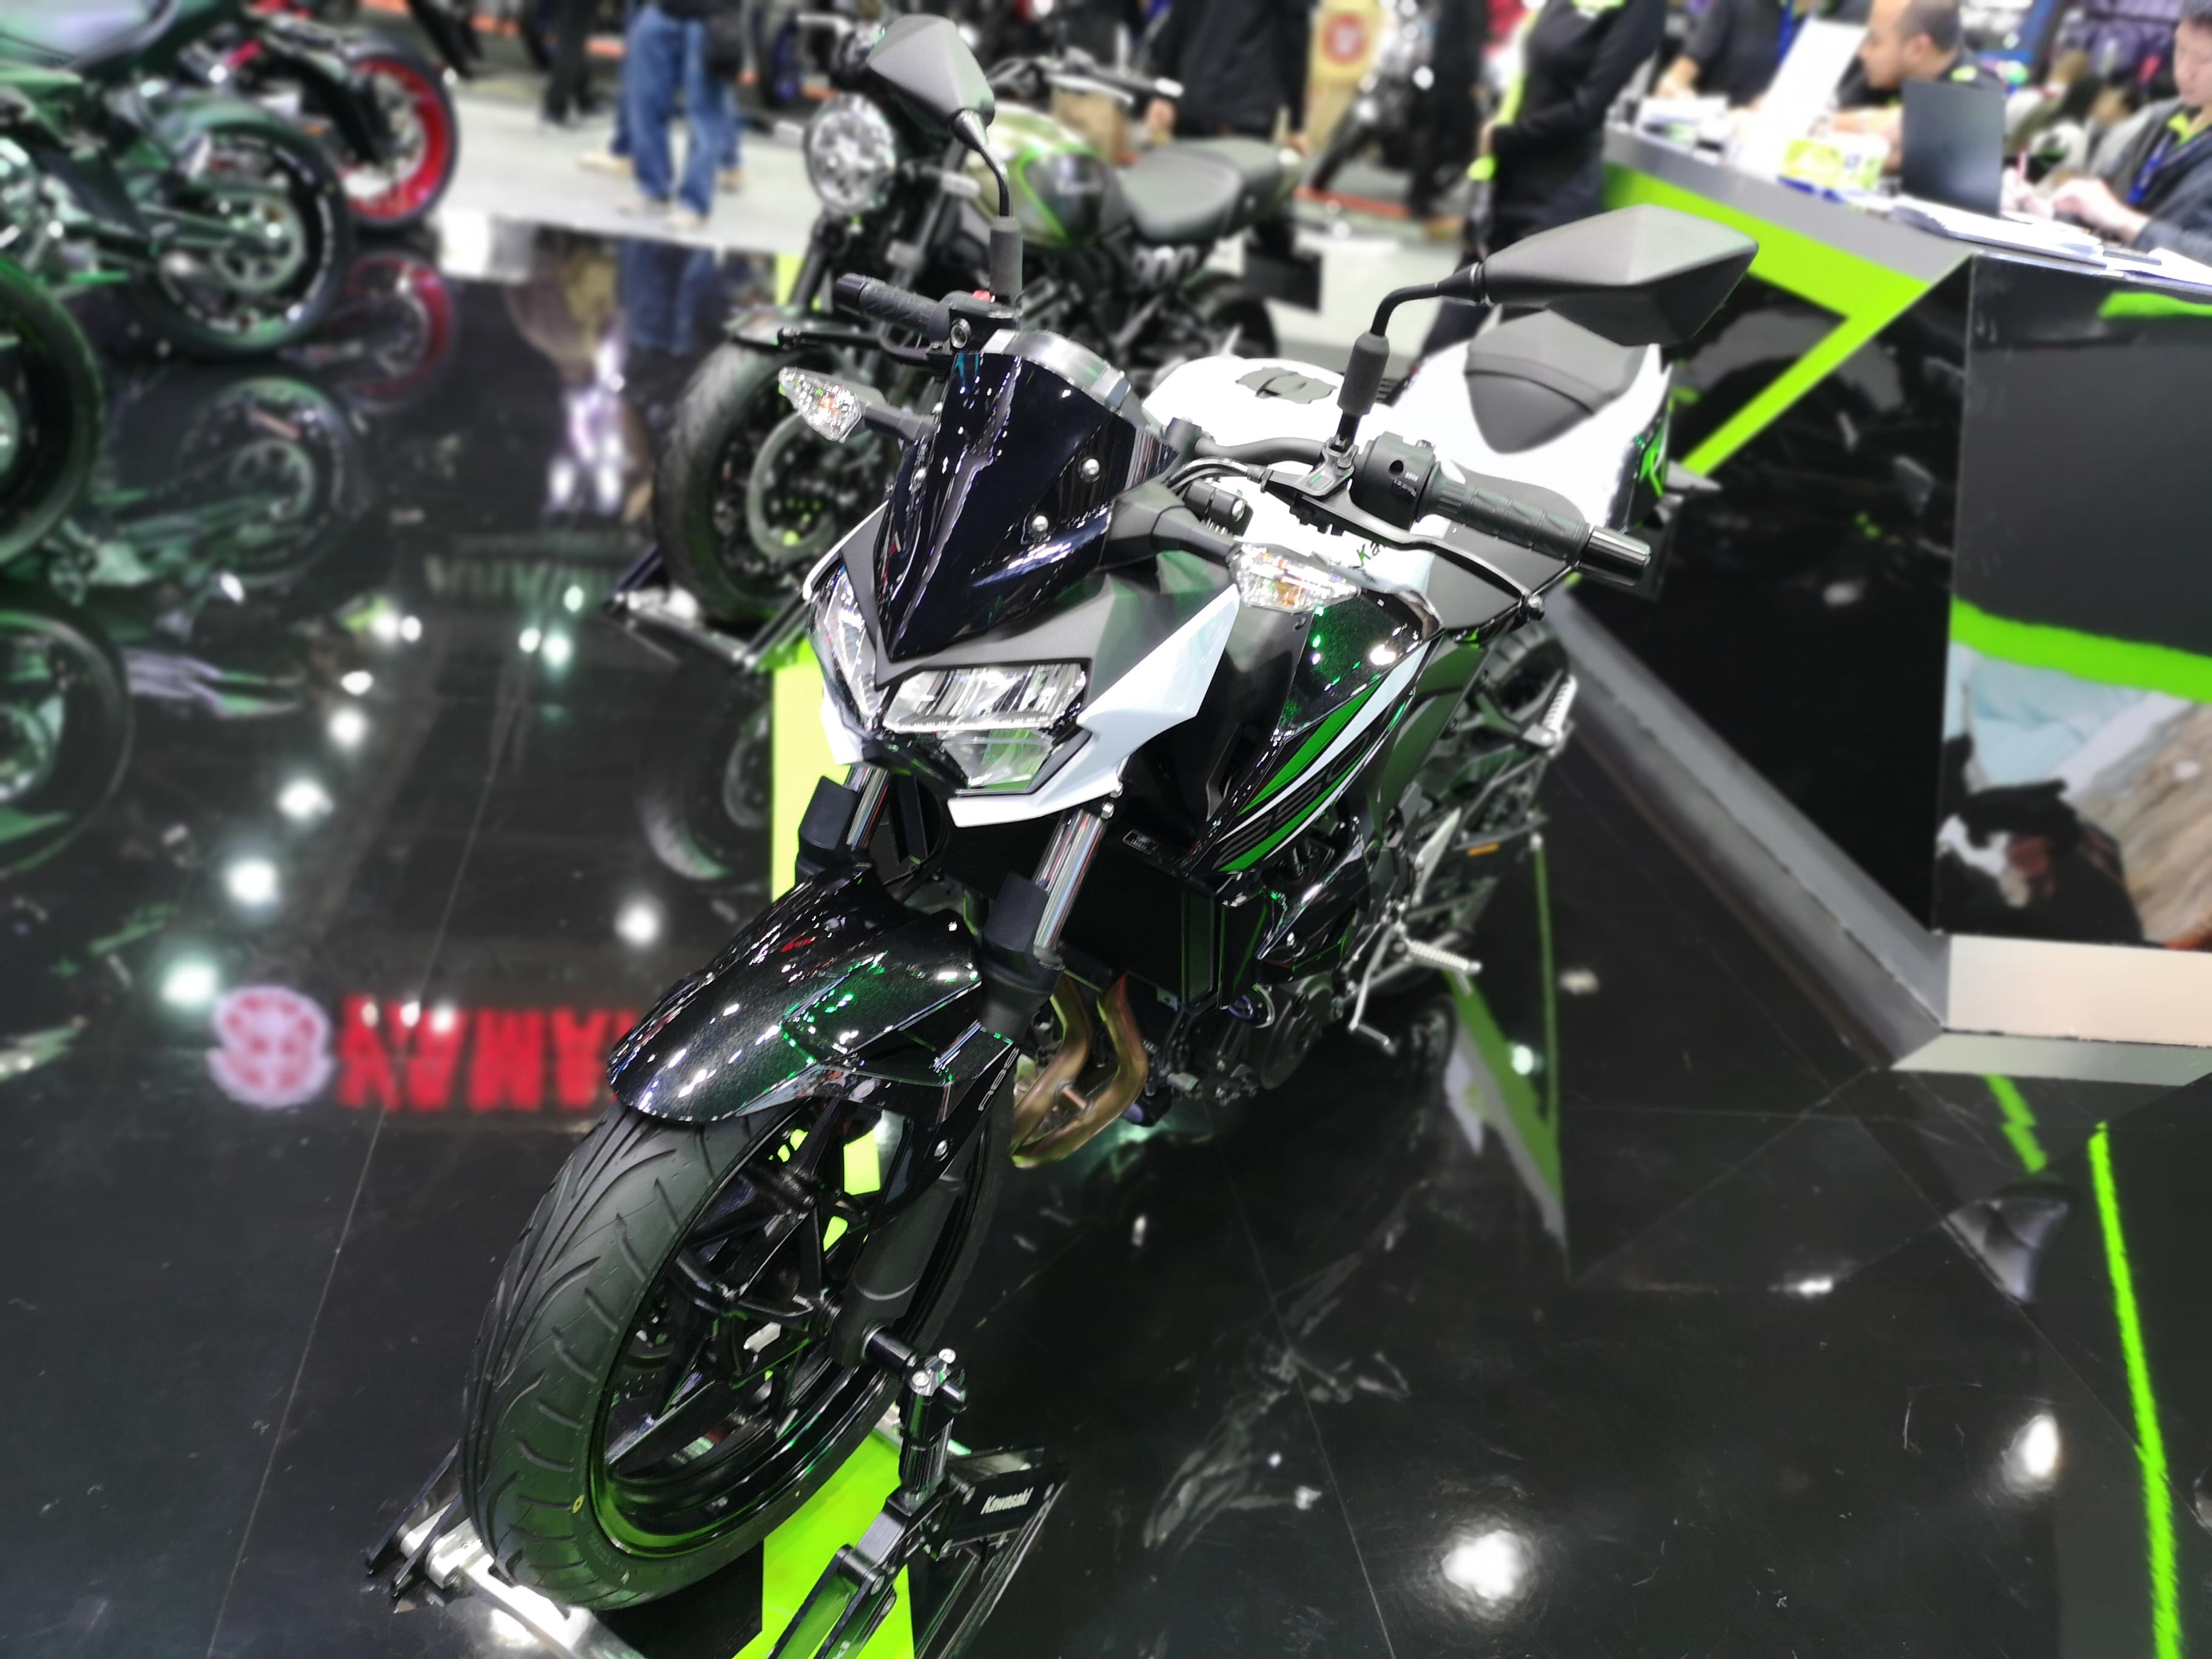 Kawasaki Z250 2019 ในงาน Motor Expo 2018